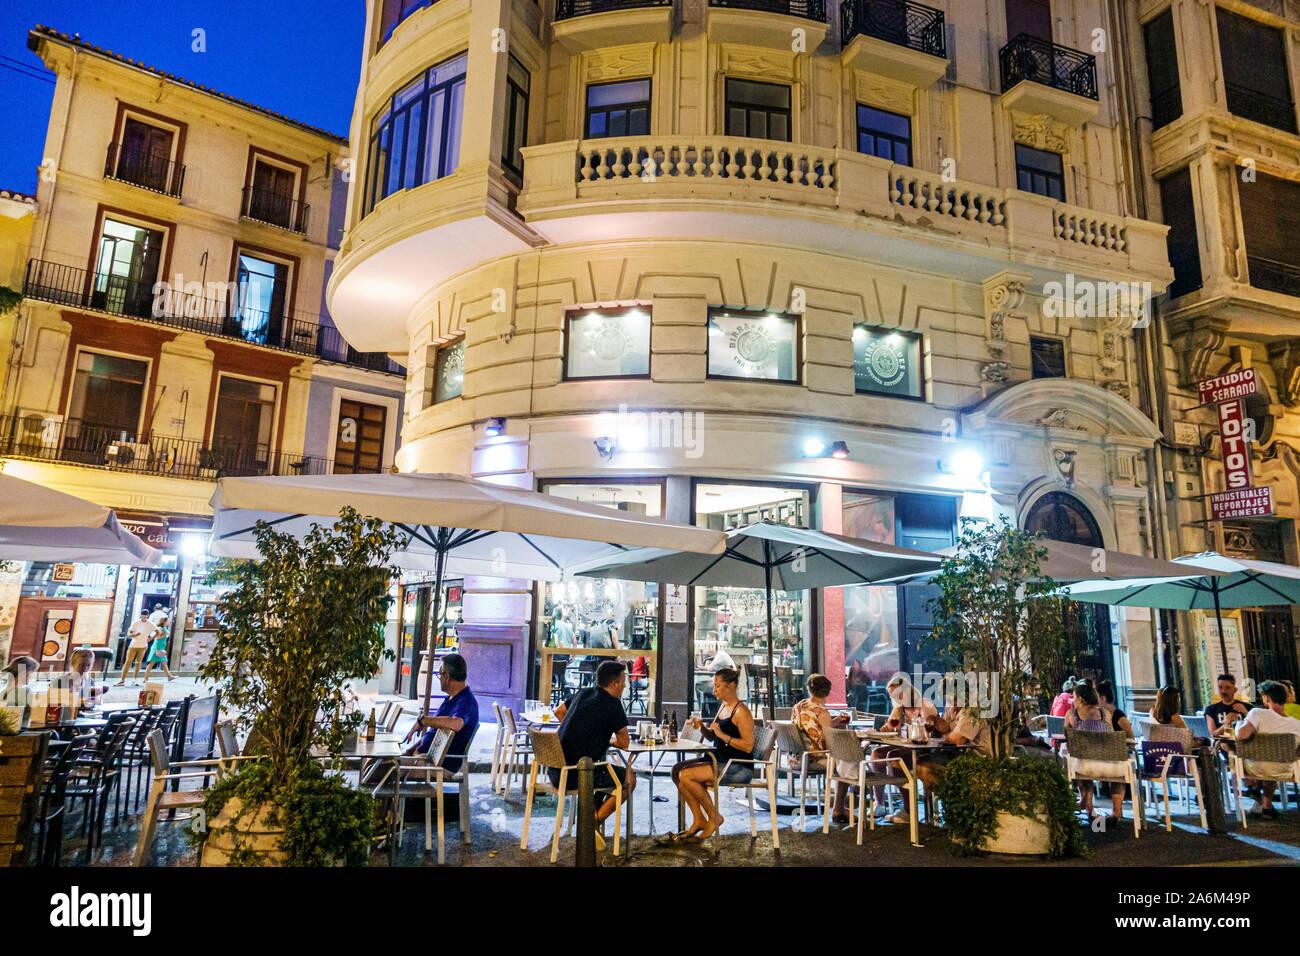 Valencia Spain Hispanic,Ciutat Vella,old city,historic center,Plaza del Mercat,Birra & Blues,restaurant,bar,night evening,al fresco dining,tables,umbr Stock Photo